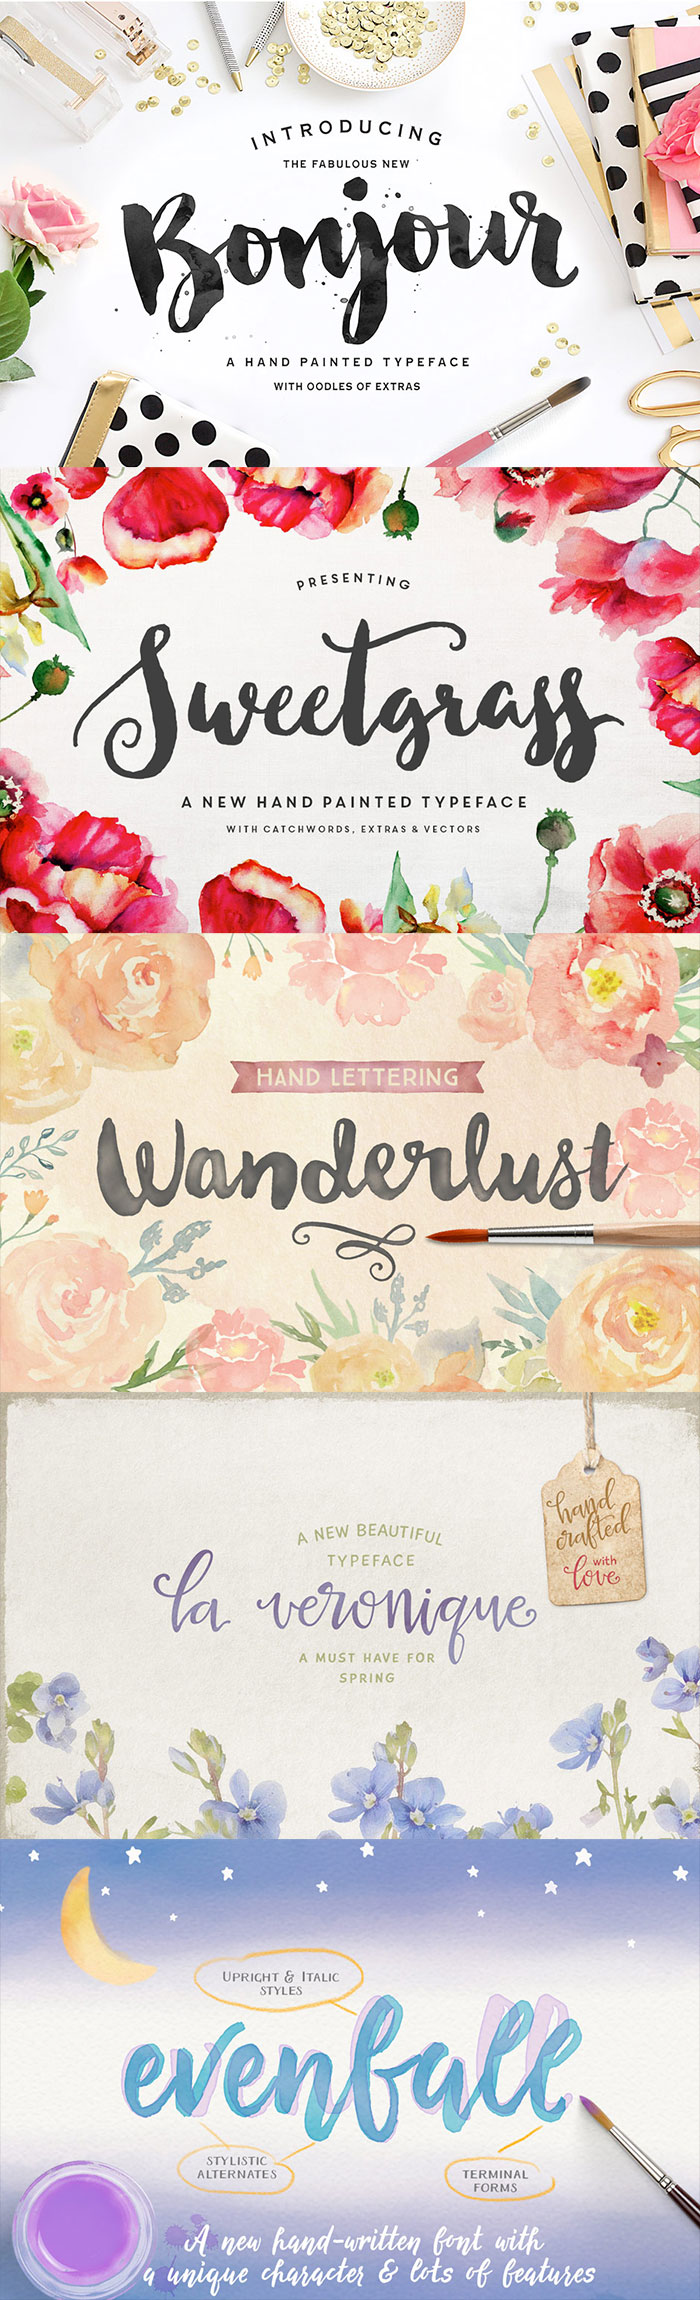 5 Gorgeous handwritten brush script fonts in this Design Cuts bundle!